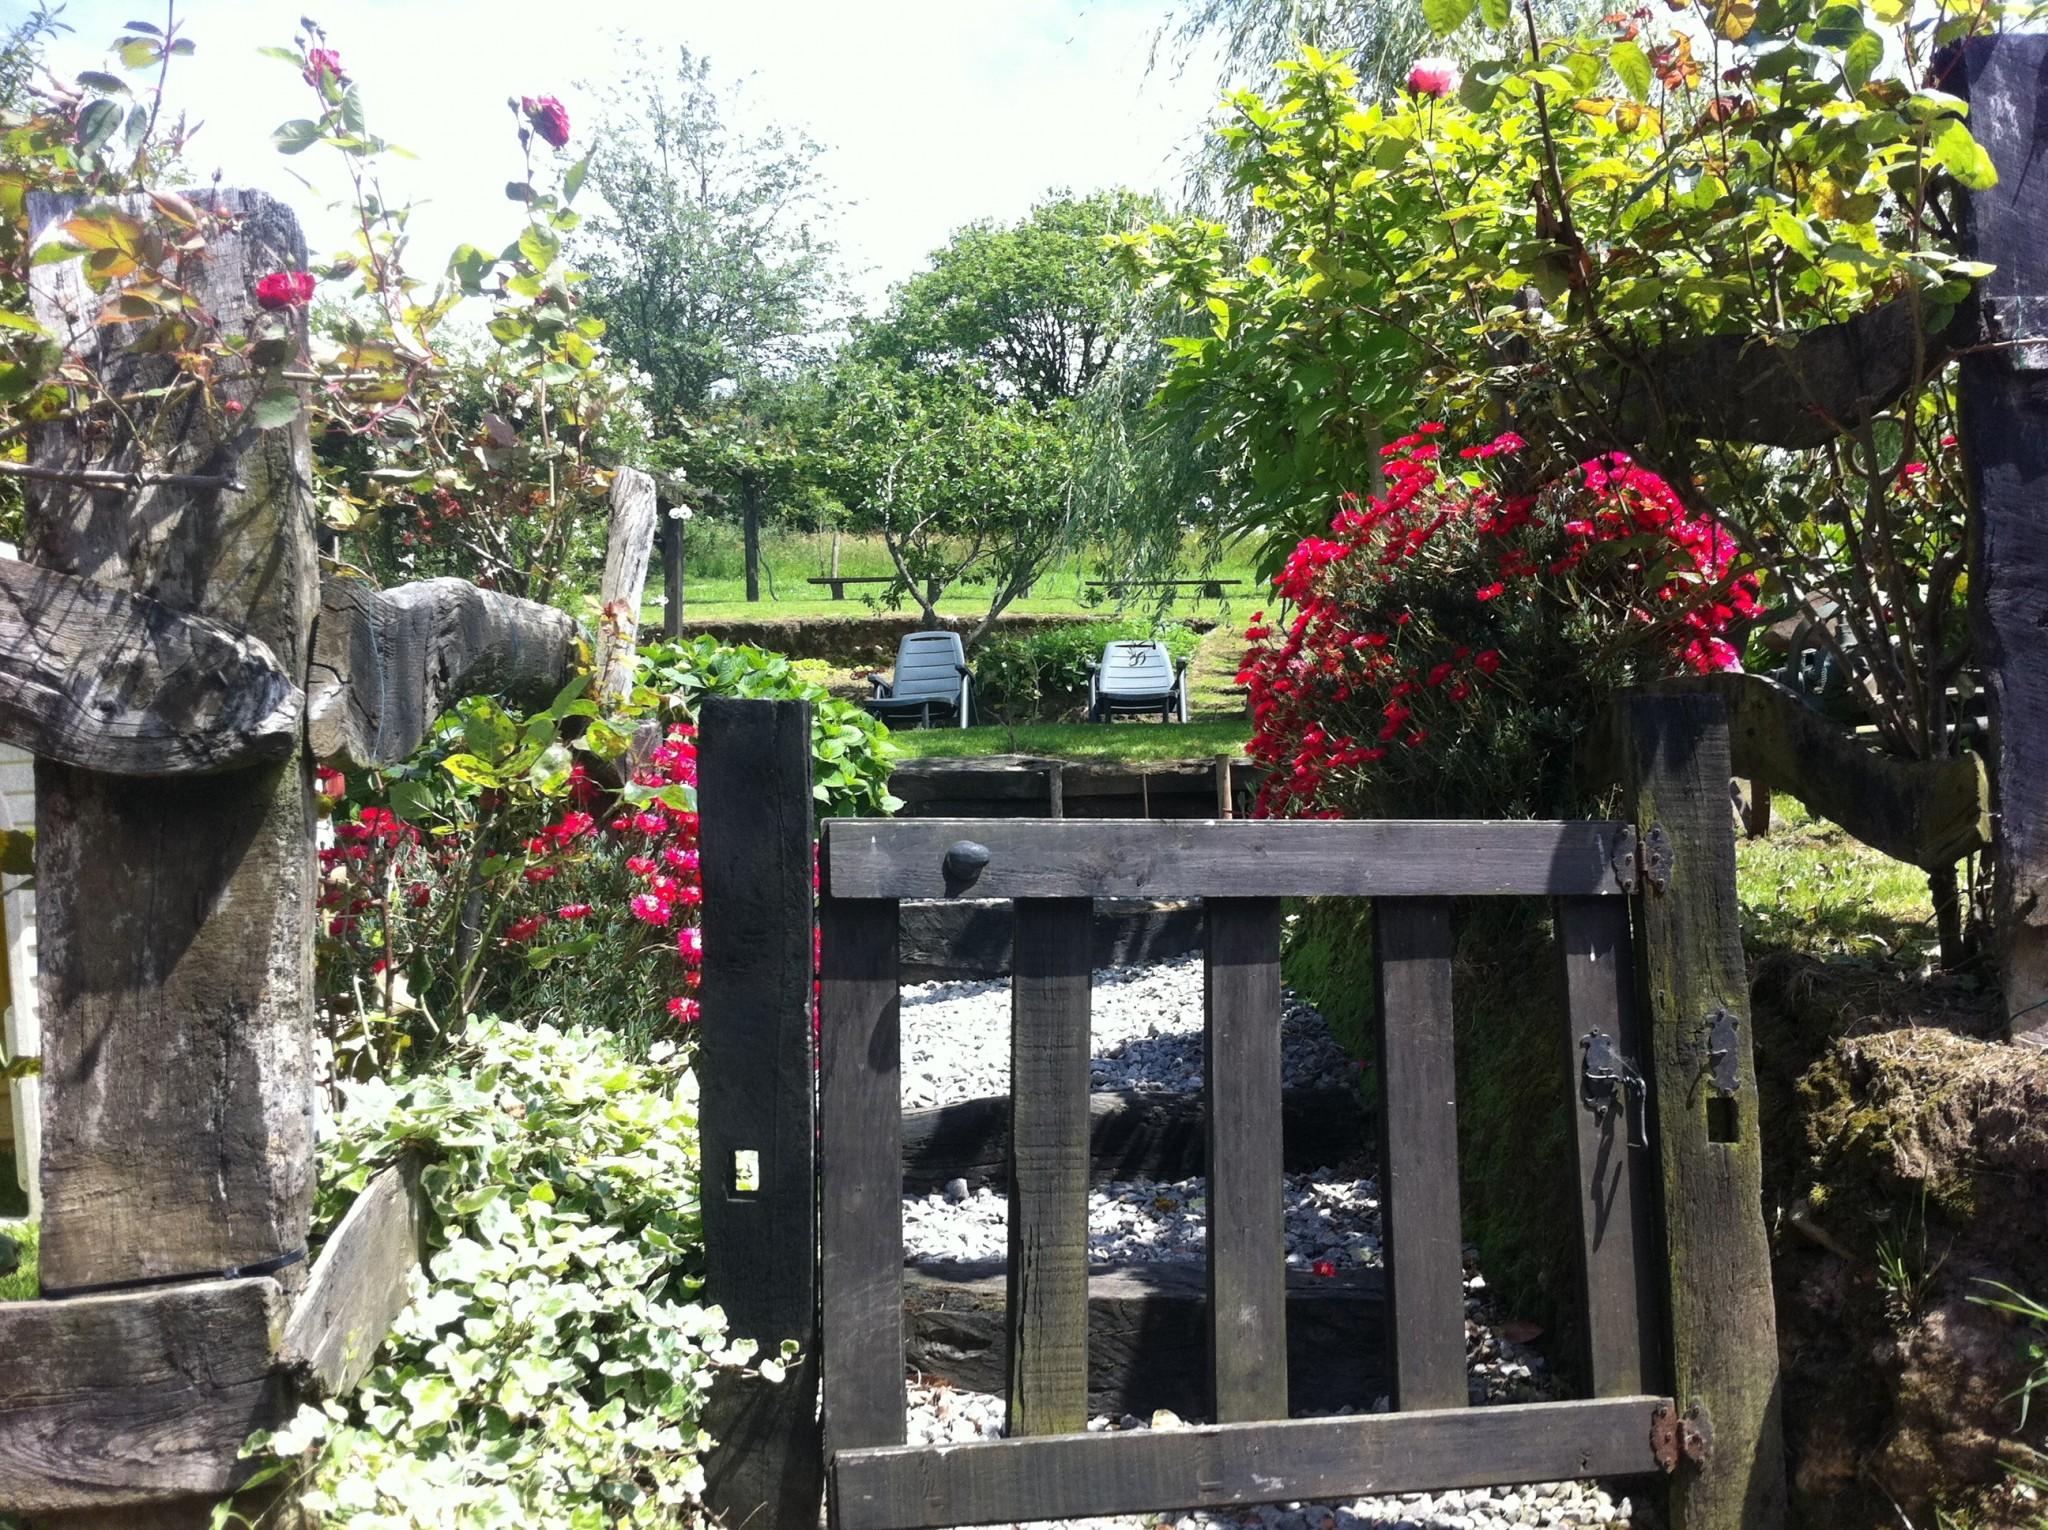 The garden cottage Rincon de Sella